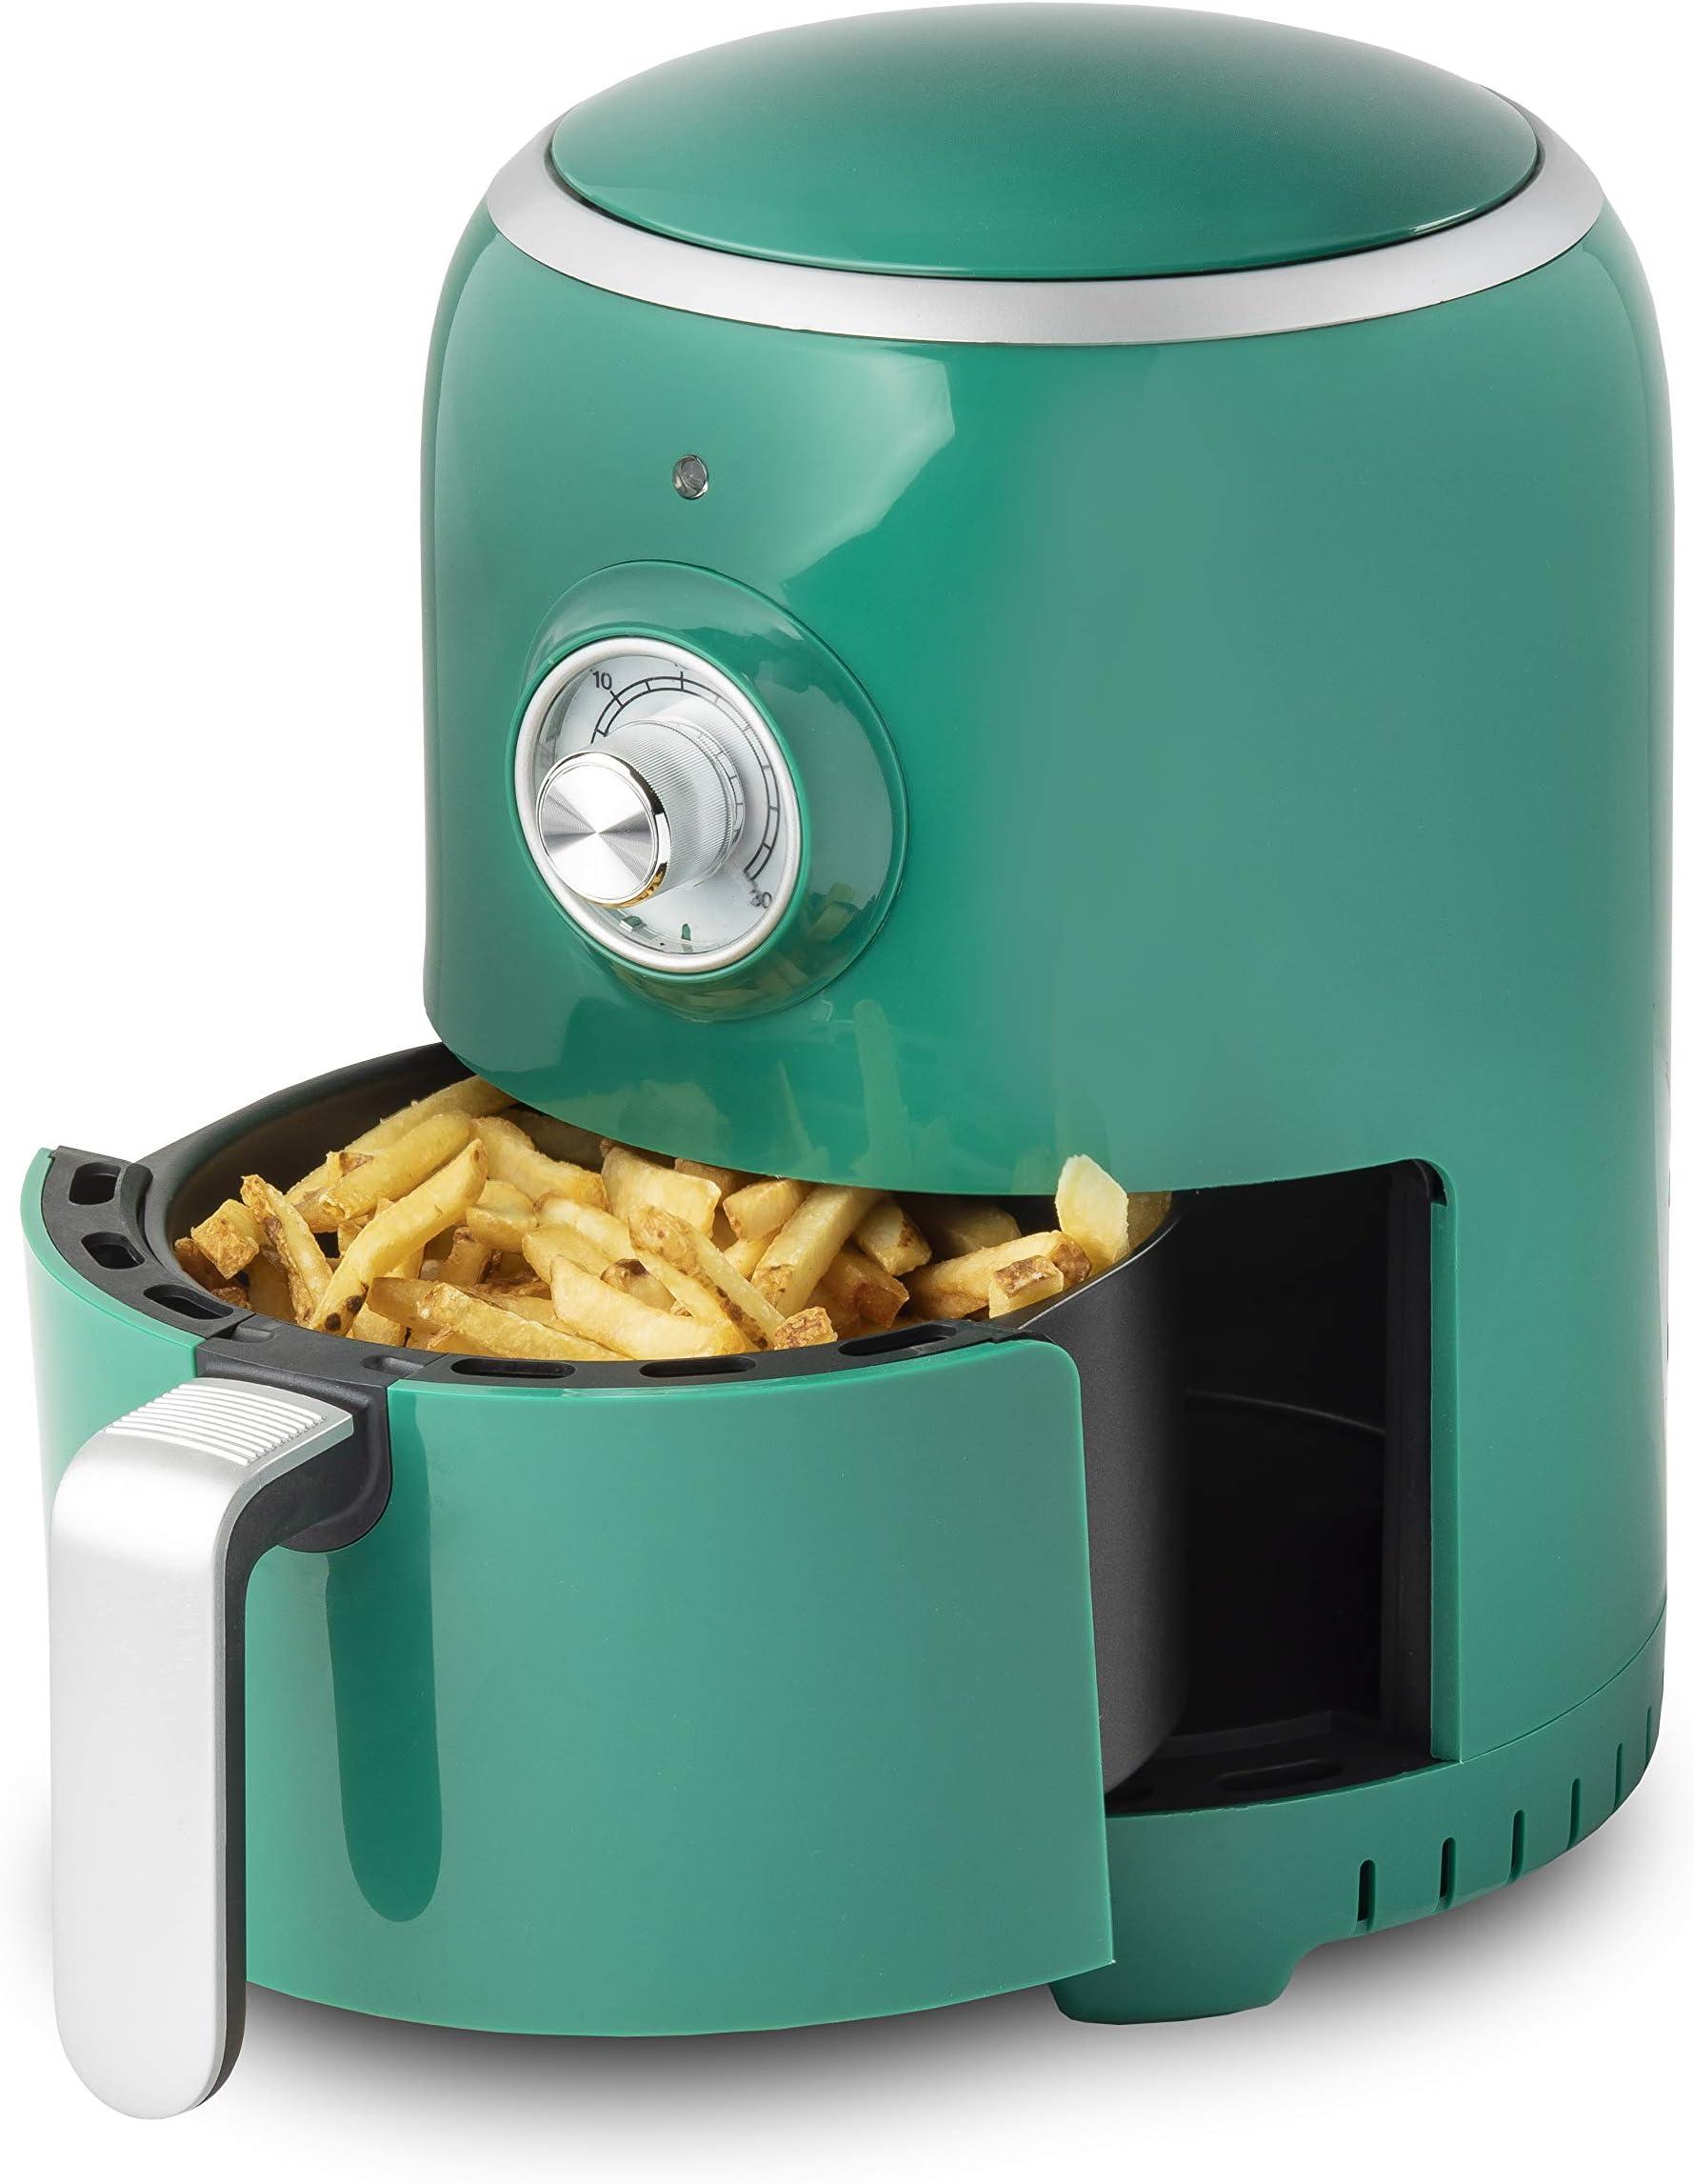 Aria Air Fryers RAG-596 Air Fryer, 2Qt, Dark Green With White Trim & Basket Handle